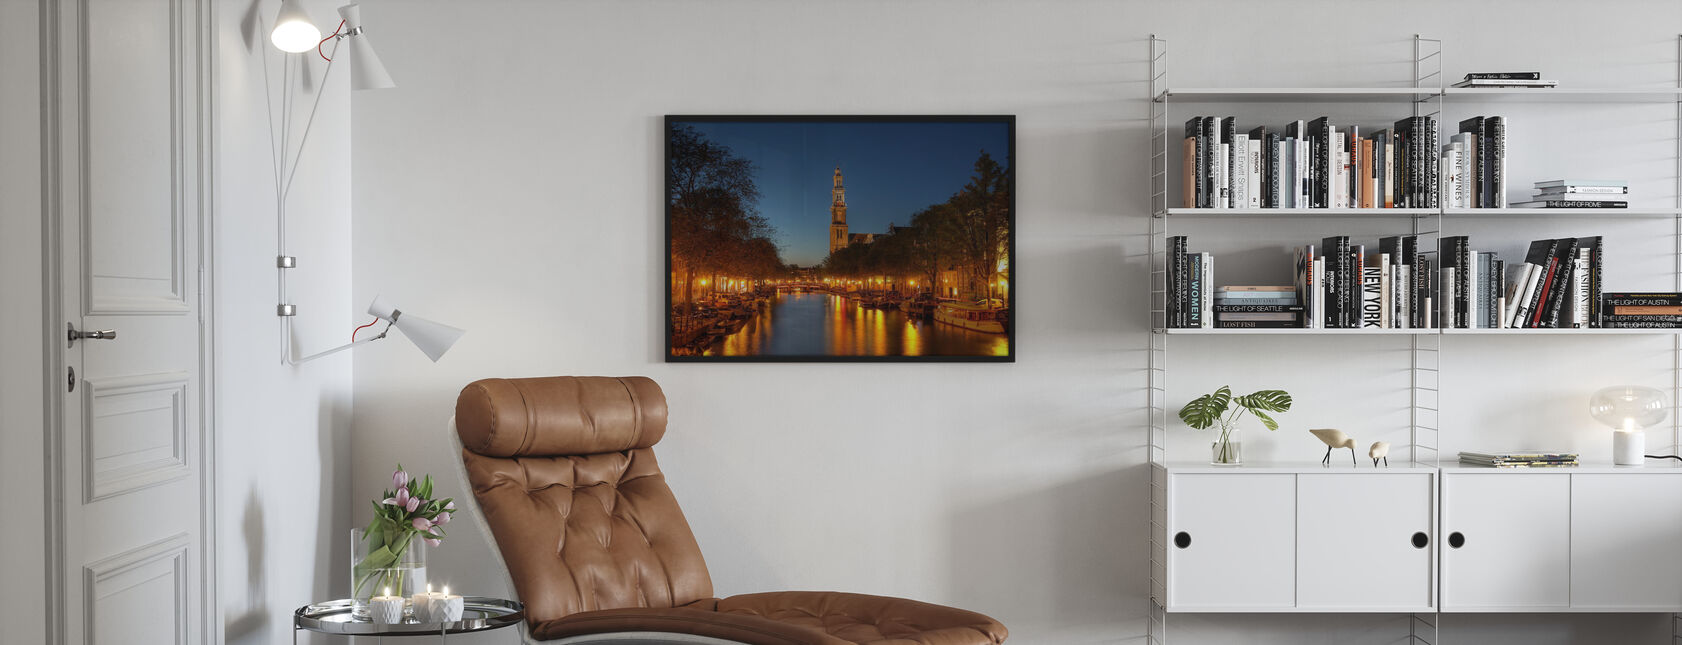 Canale Prinsengracht ad Amsterdam - Poster - Salotto